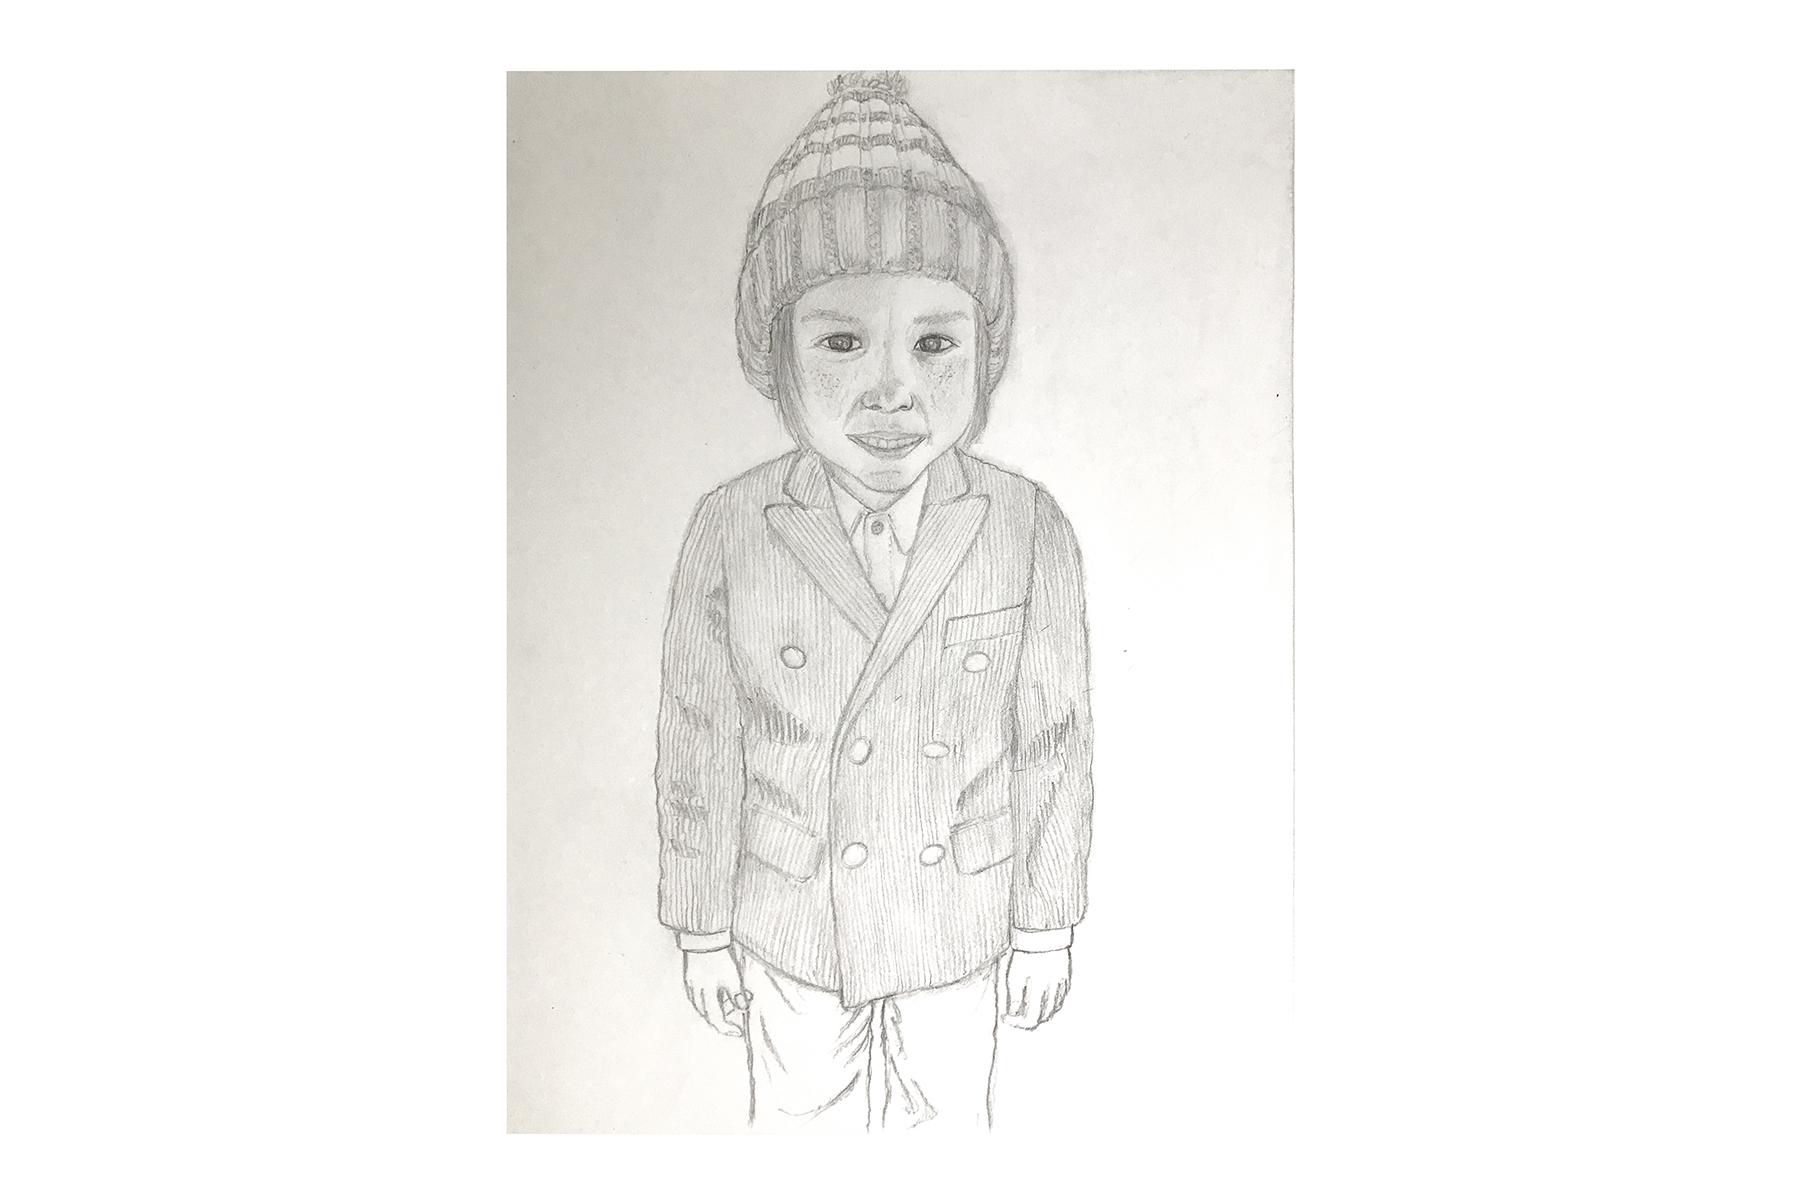 Alden (2014) -  Pencil on Paper